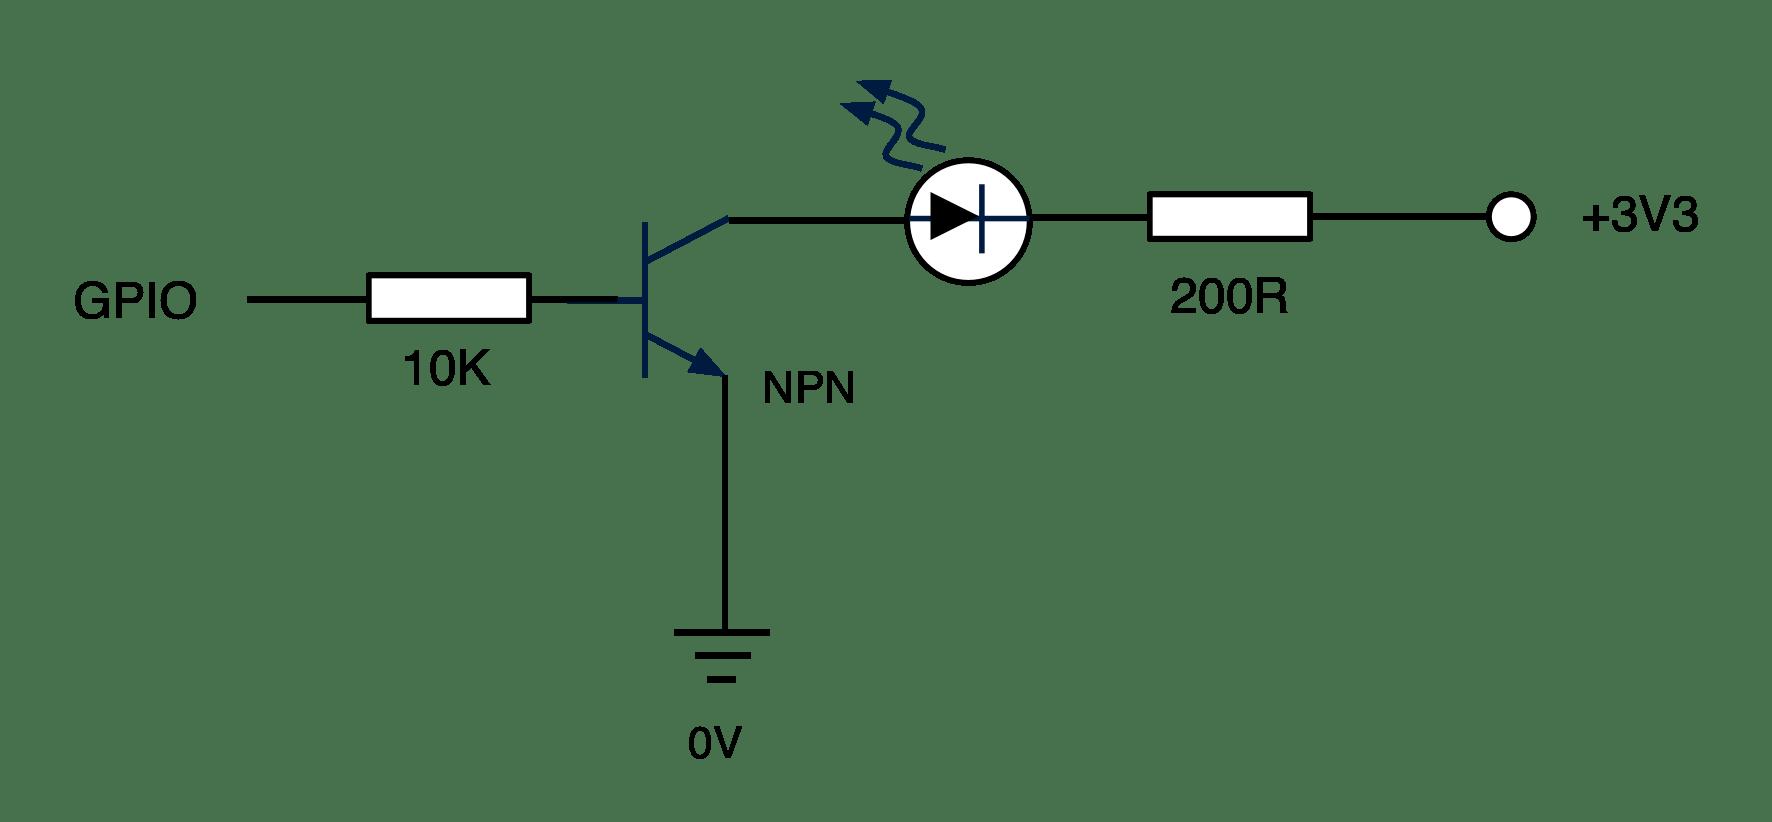 hight resolution of ir blaster wiring diagram wiring diagramir blaster wiring diagram wiring librarydiagram ir over ip diagram ir